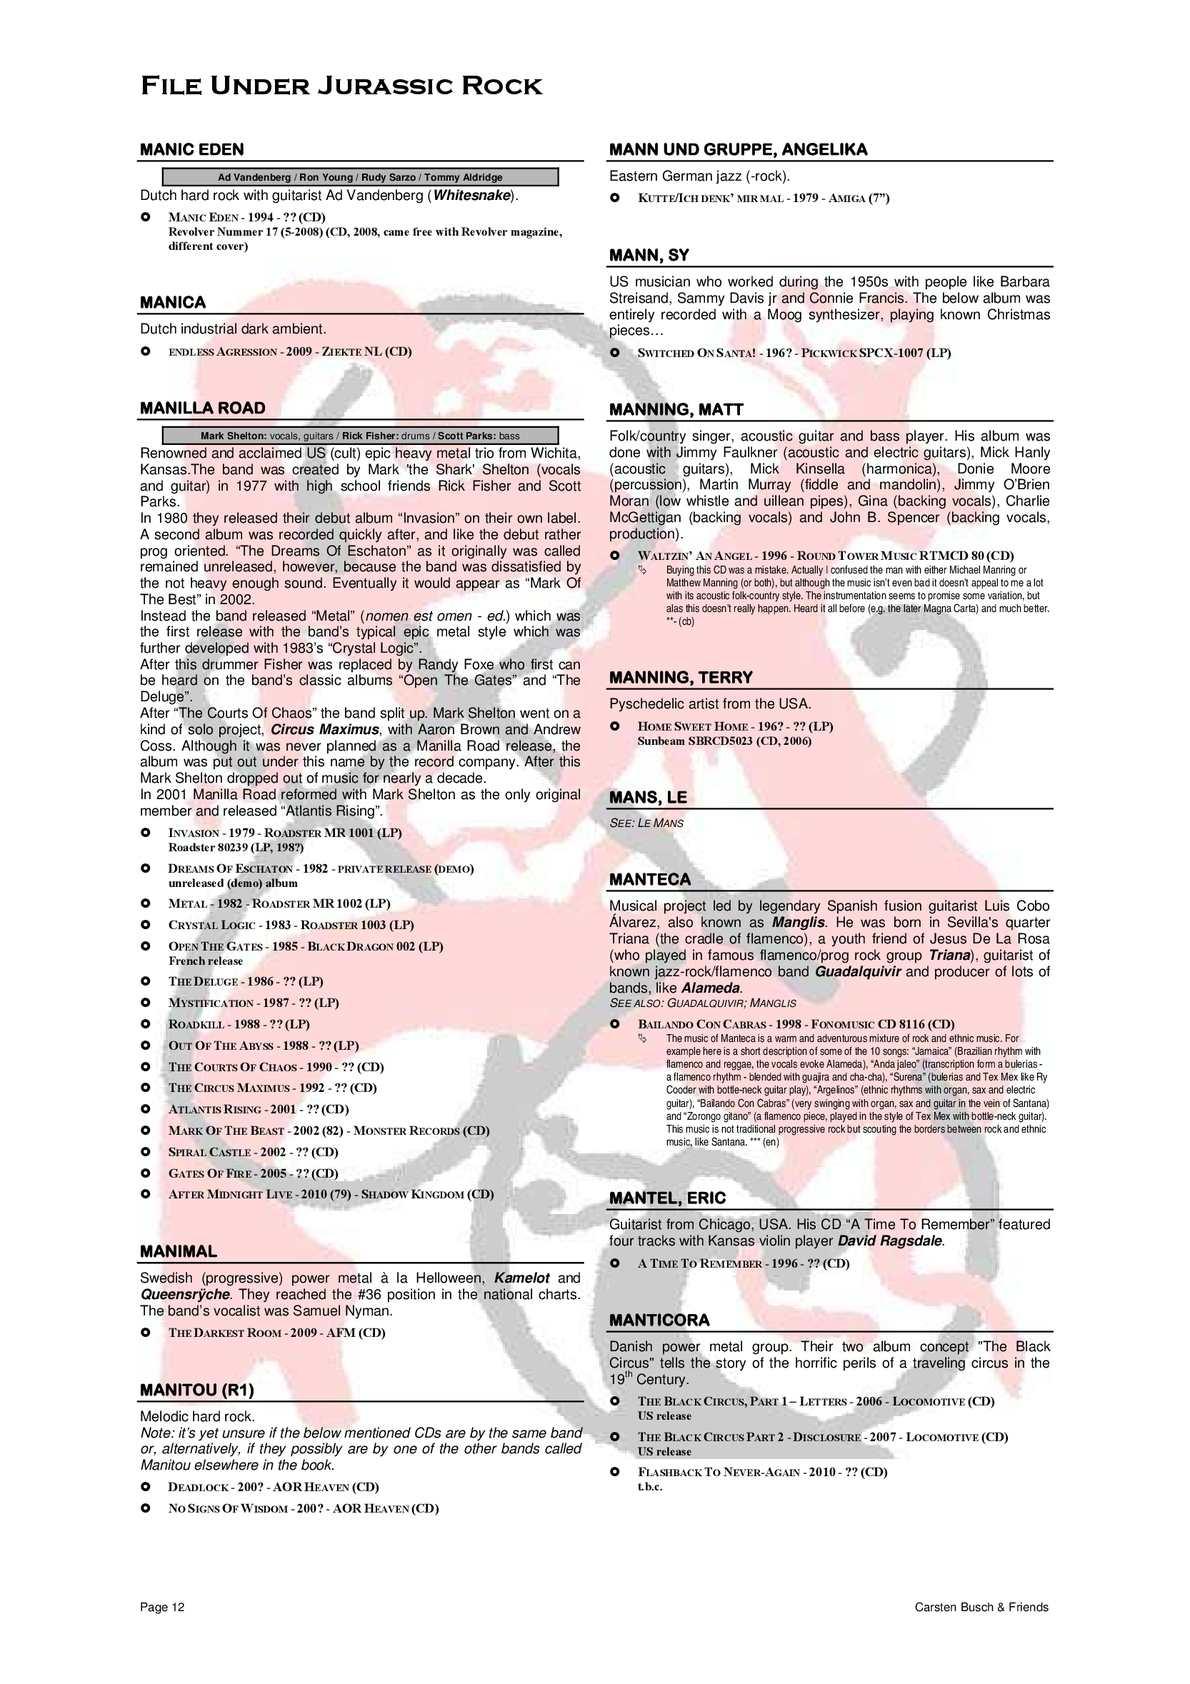 File Under Jurassic Rock - Mzz appendix (2010) - CALAMEO